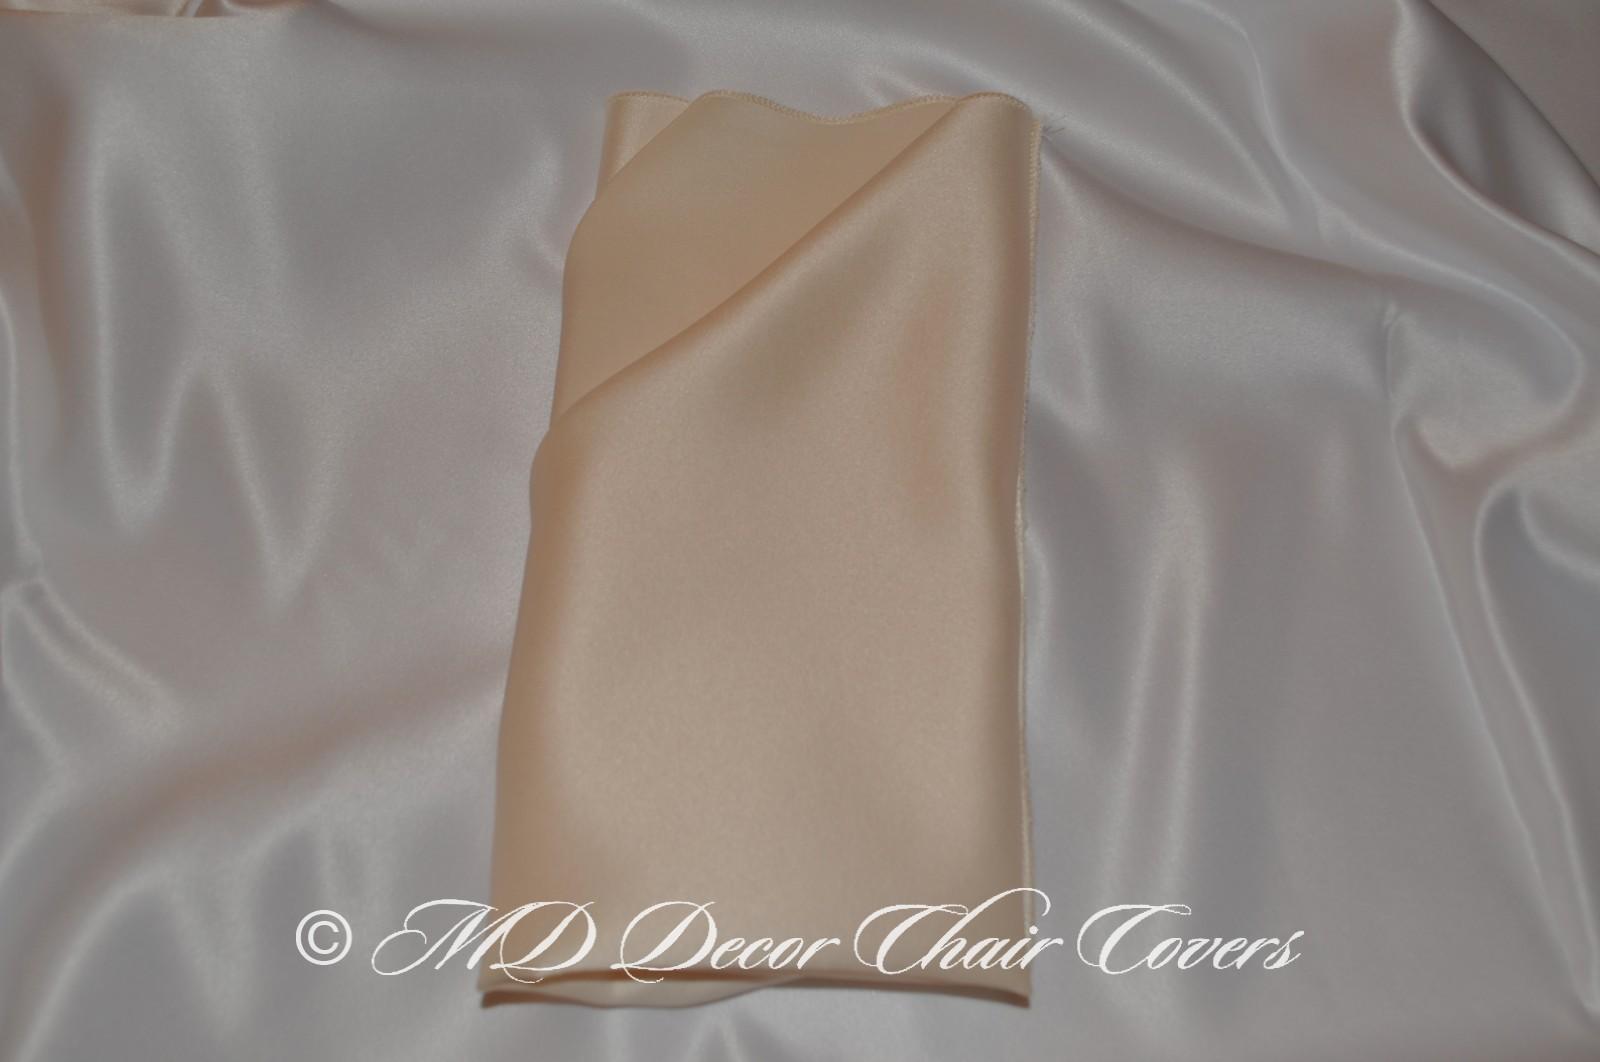 Gold satin lamour napkin